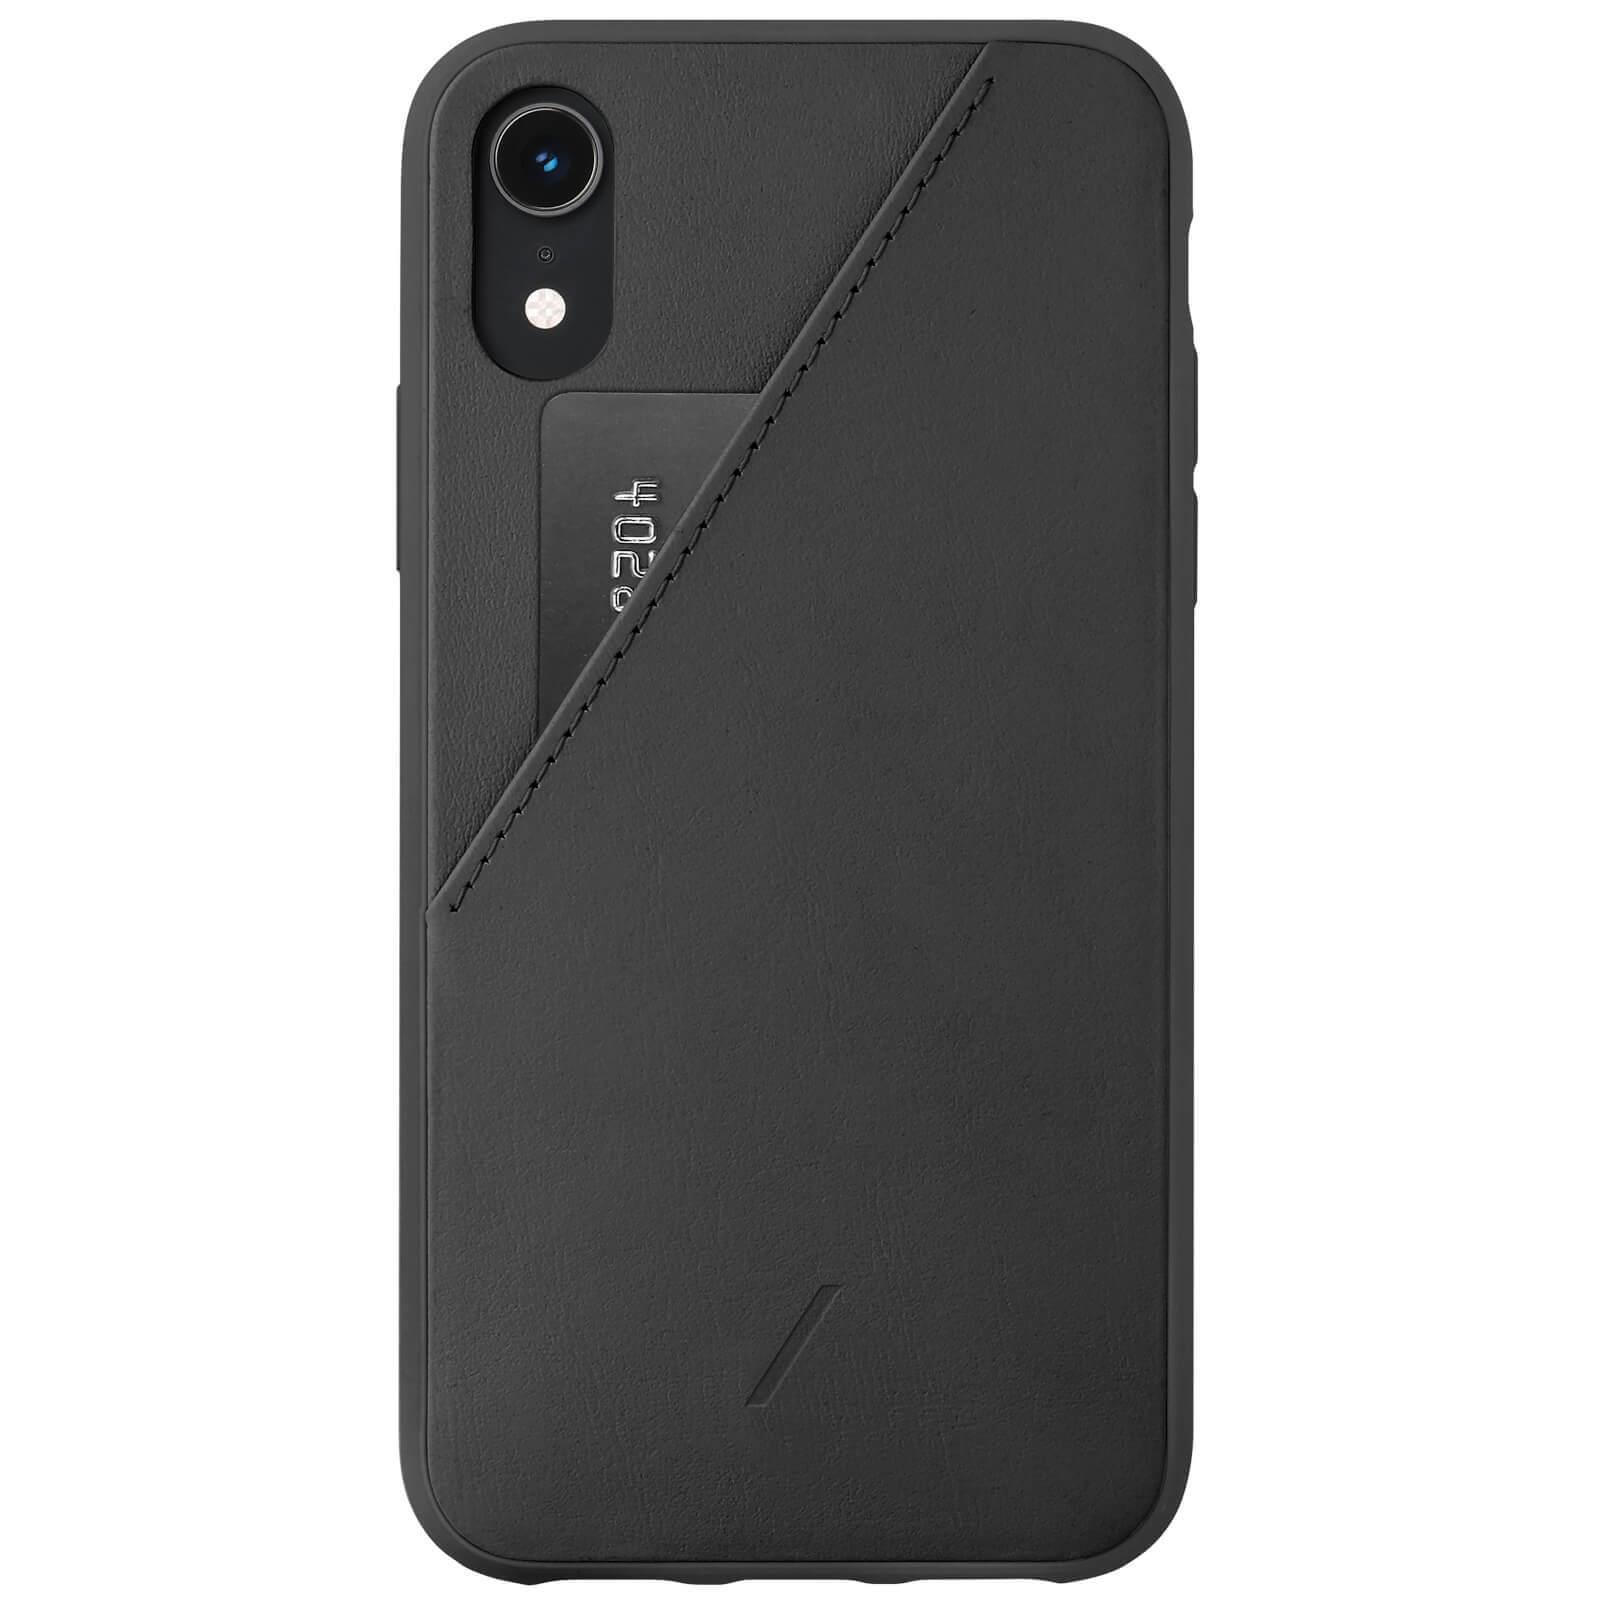 Native Union Clic Card iPhone XR Case - Black